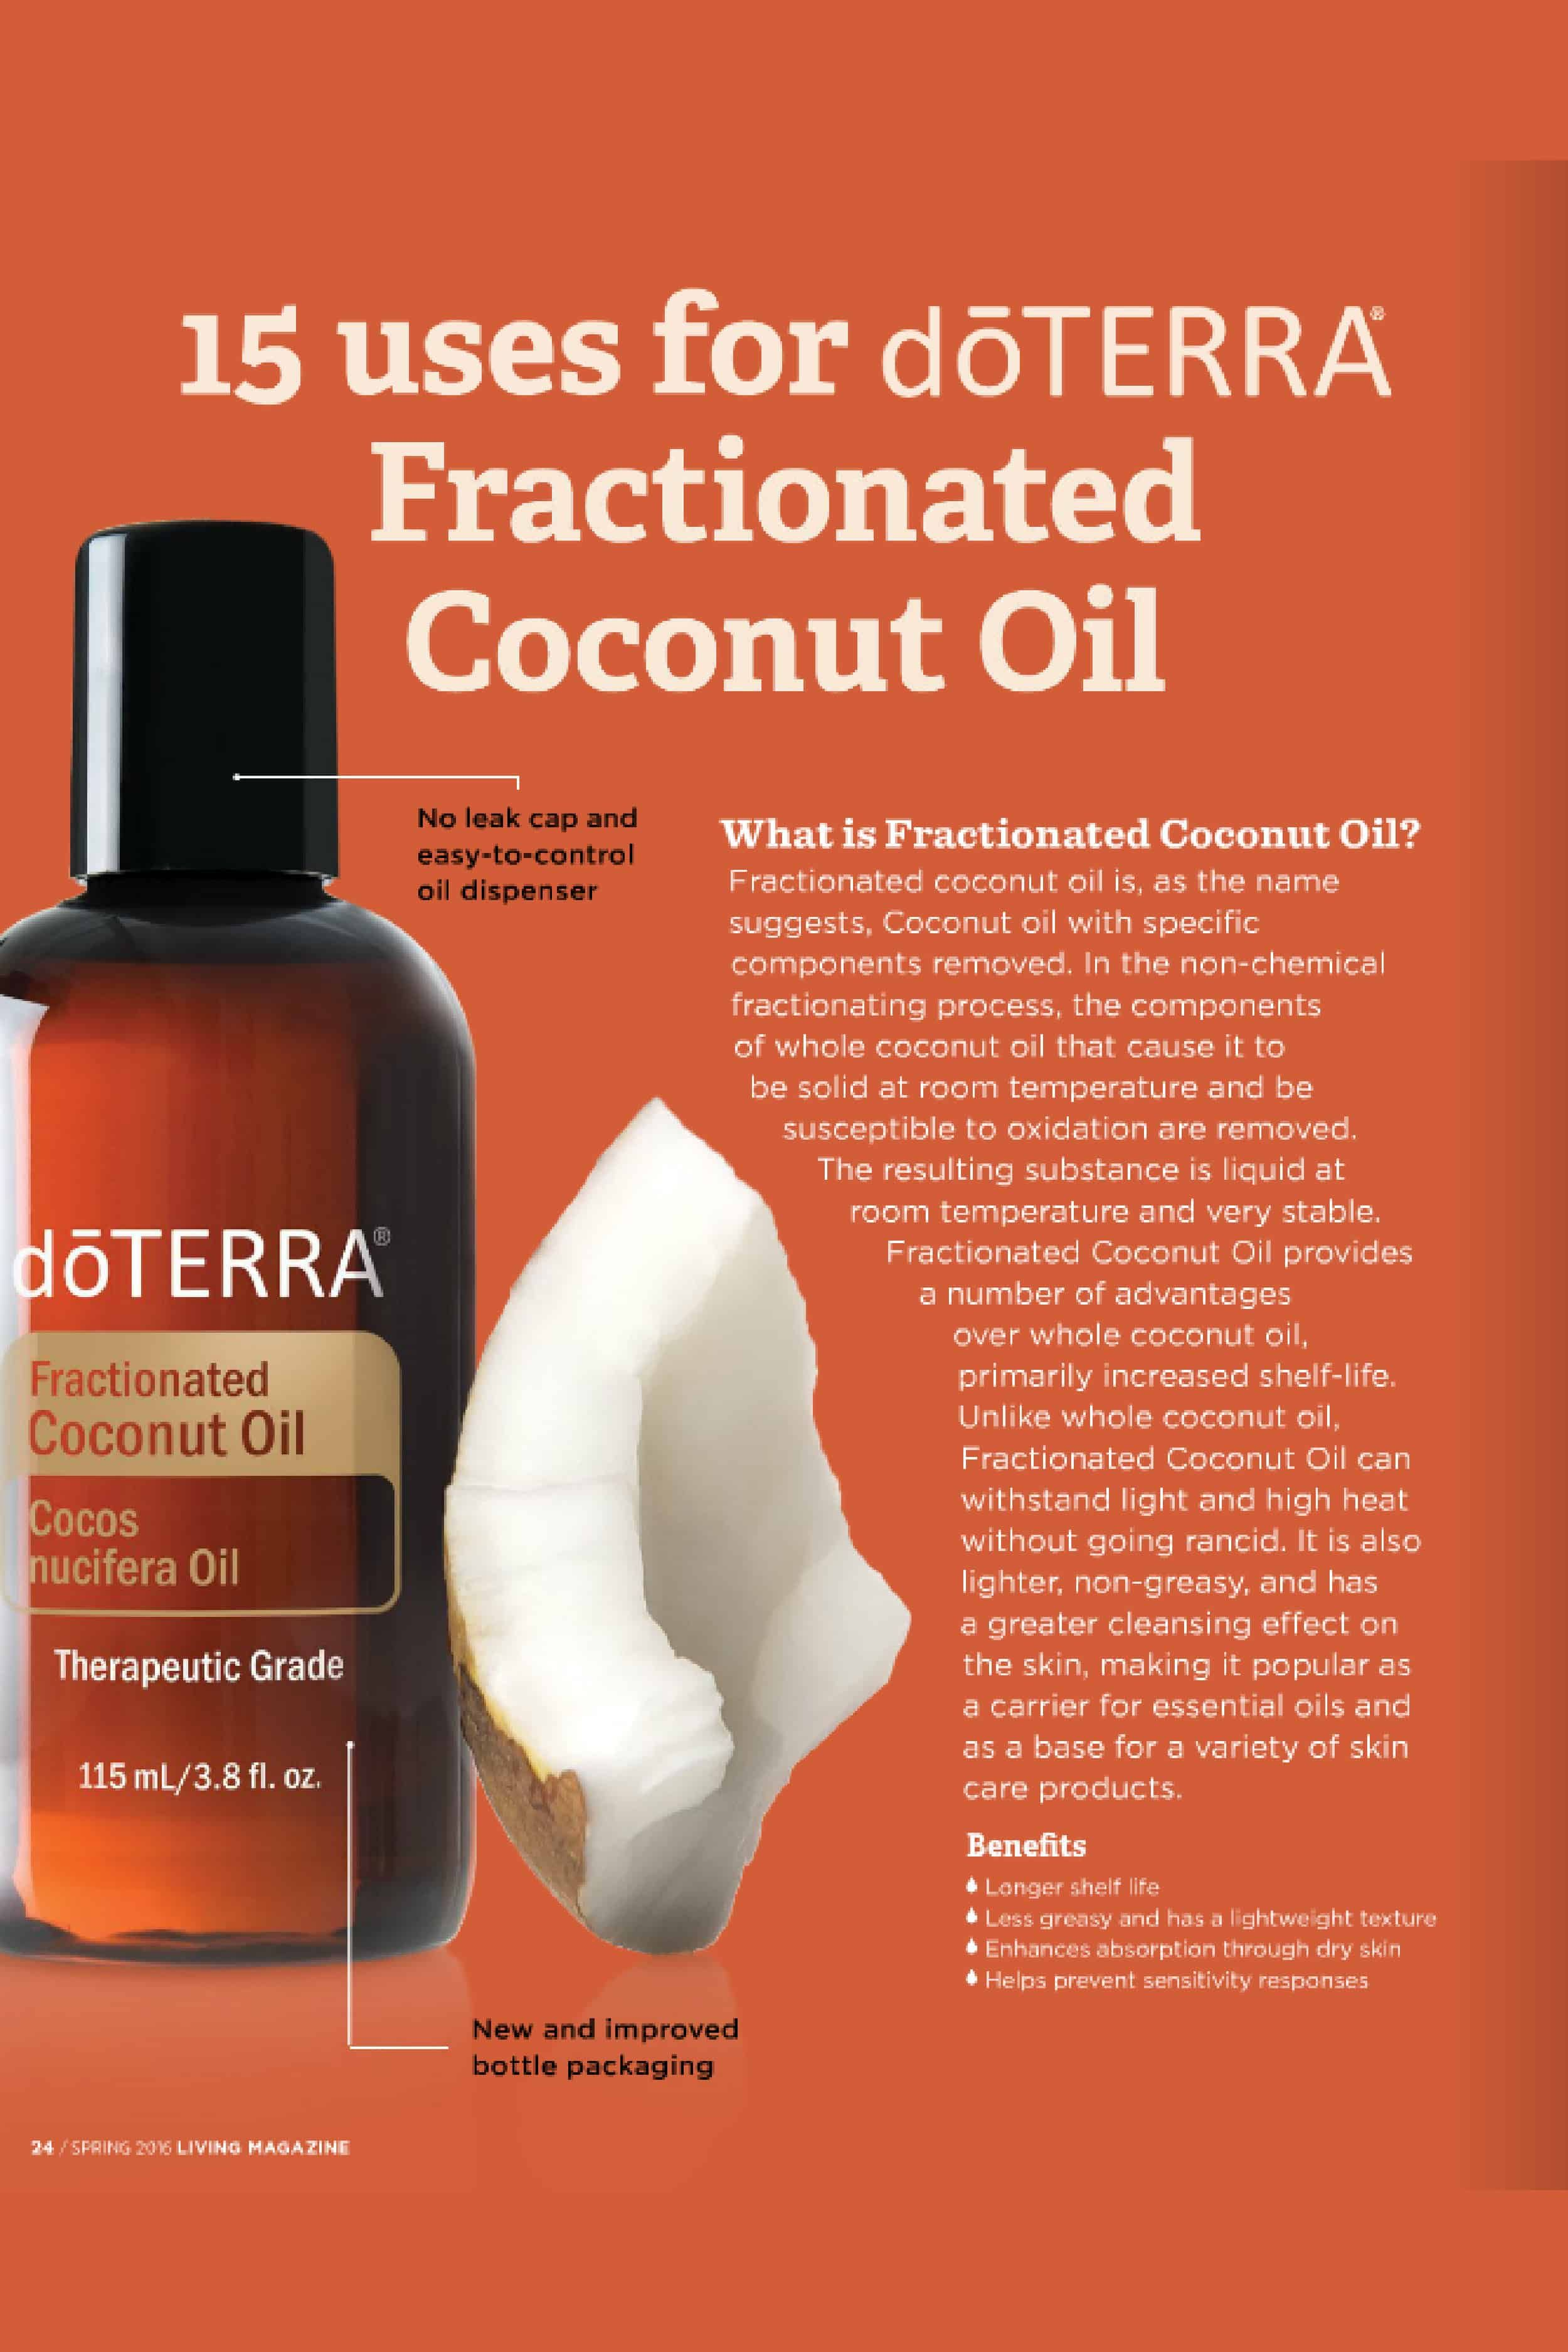 Uses for doTERRA Fractionated Coconut Oil | Health & Fittness